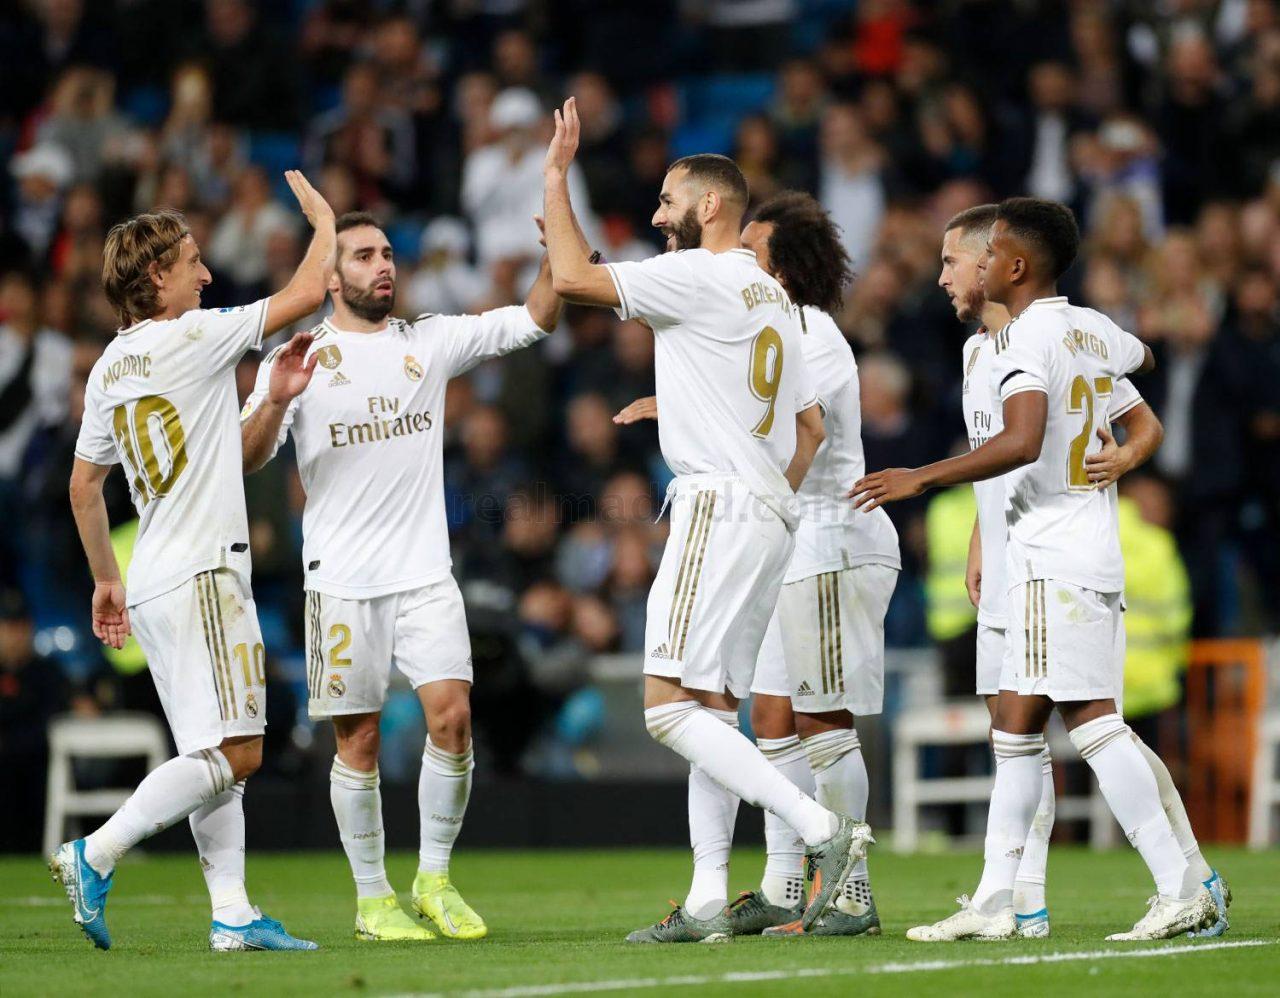 Real-Madrid-1-1280x998.jpg